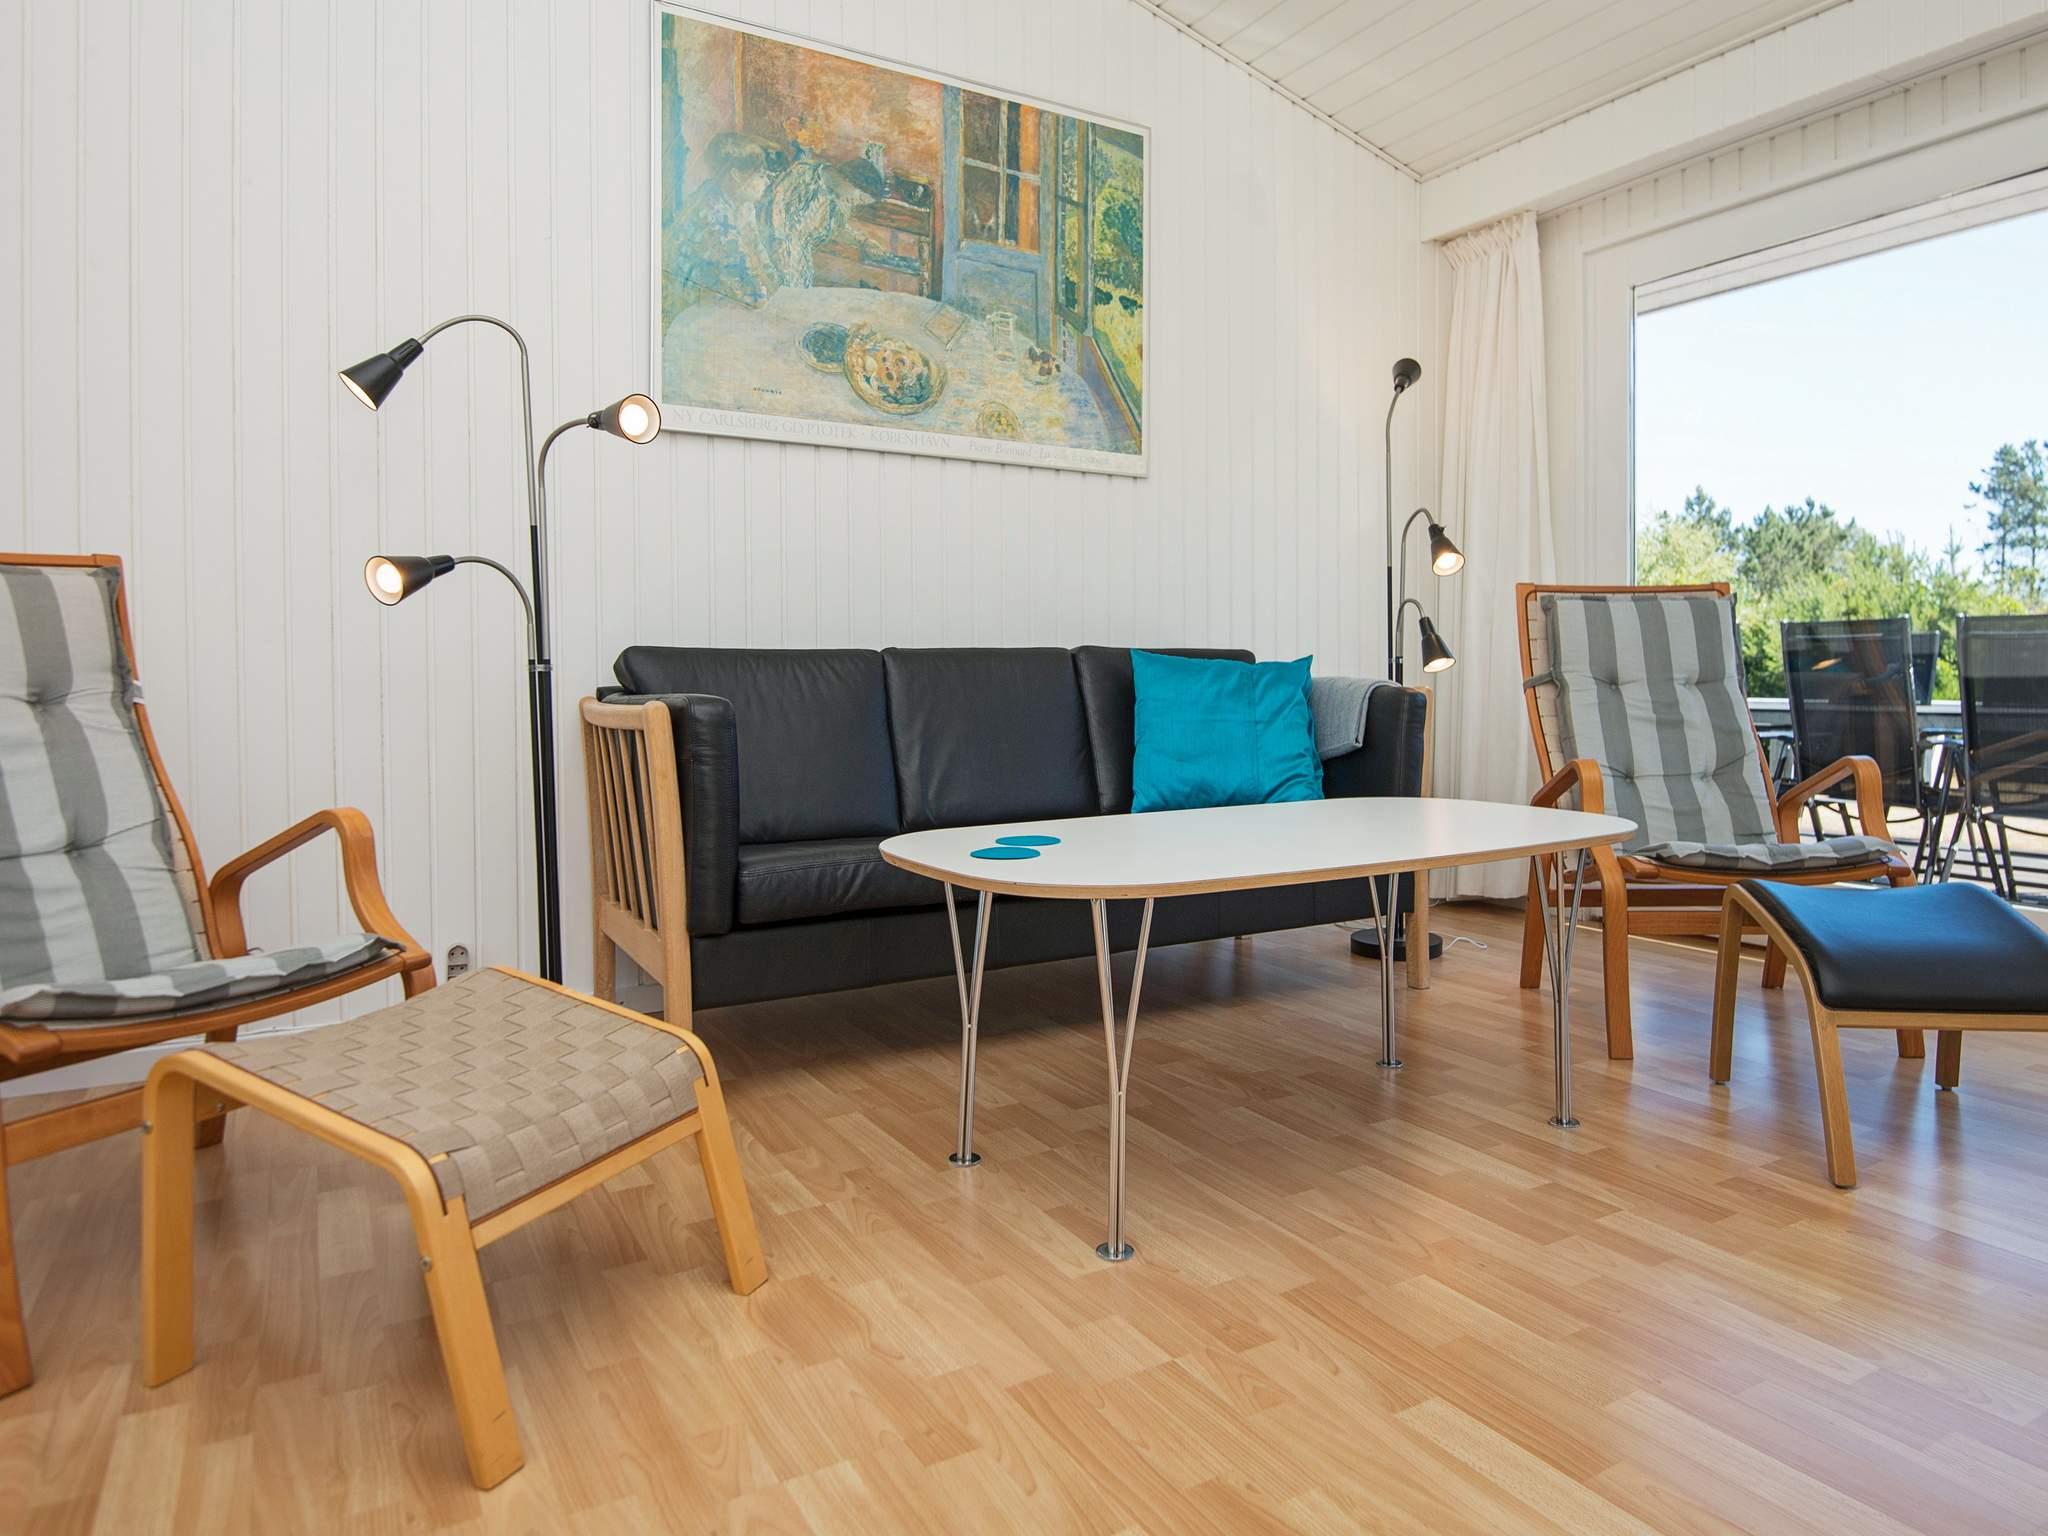 Ferienhaus Helgenæs (978615), Knebel, , Ostjütland, Dänemark, Bild 2